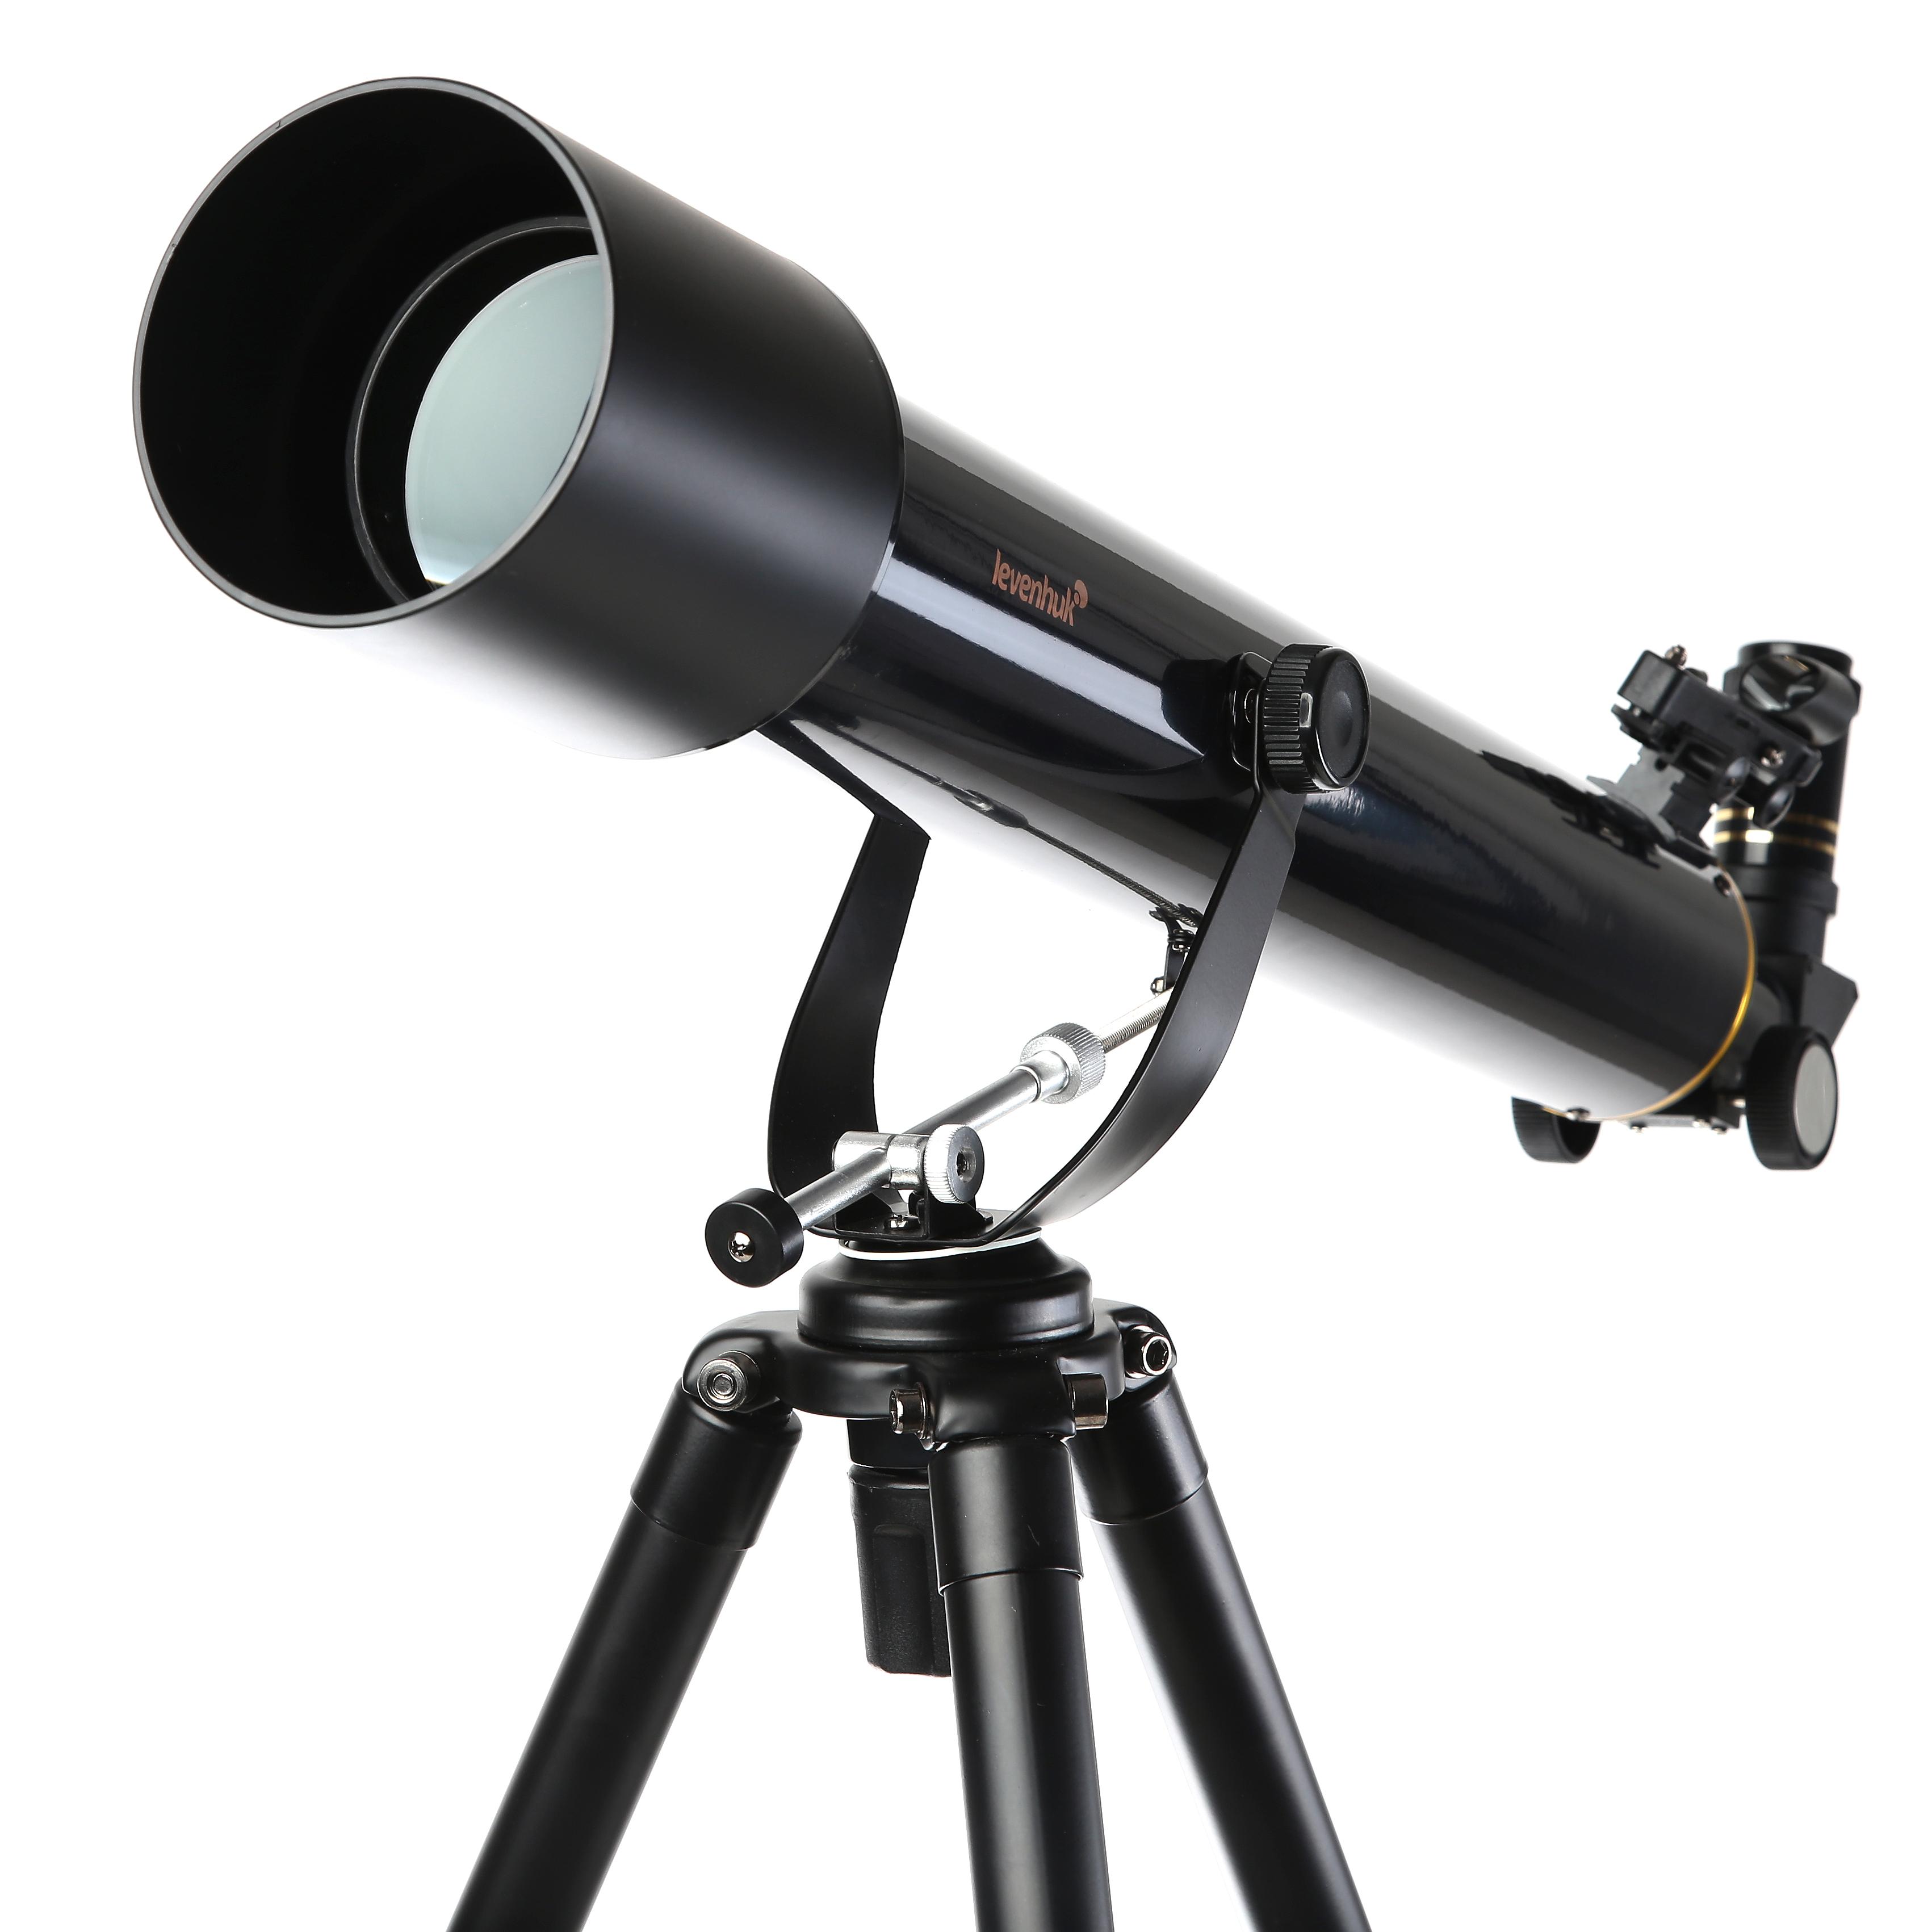 Телескоп Levenhuk Strike 80 ng (ru) набор готовых микропрепаратов levenhuk левенгук n10 ng